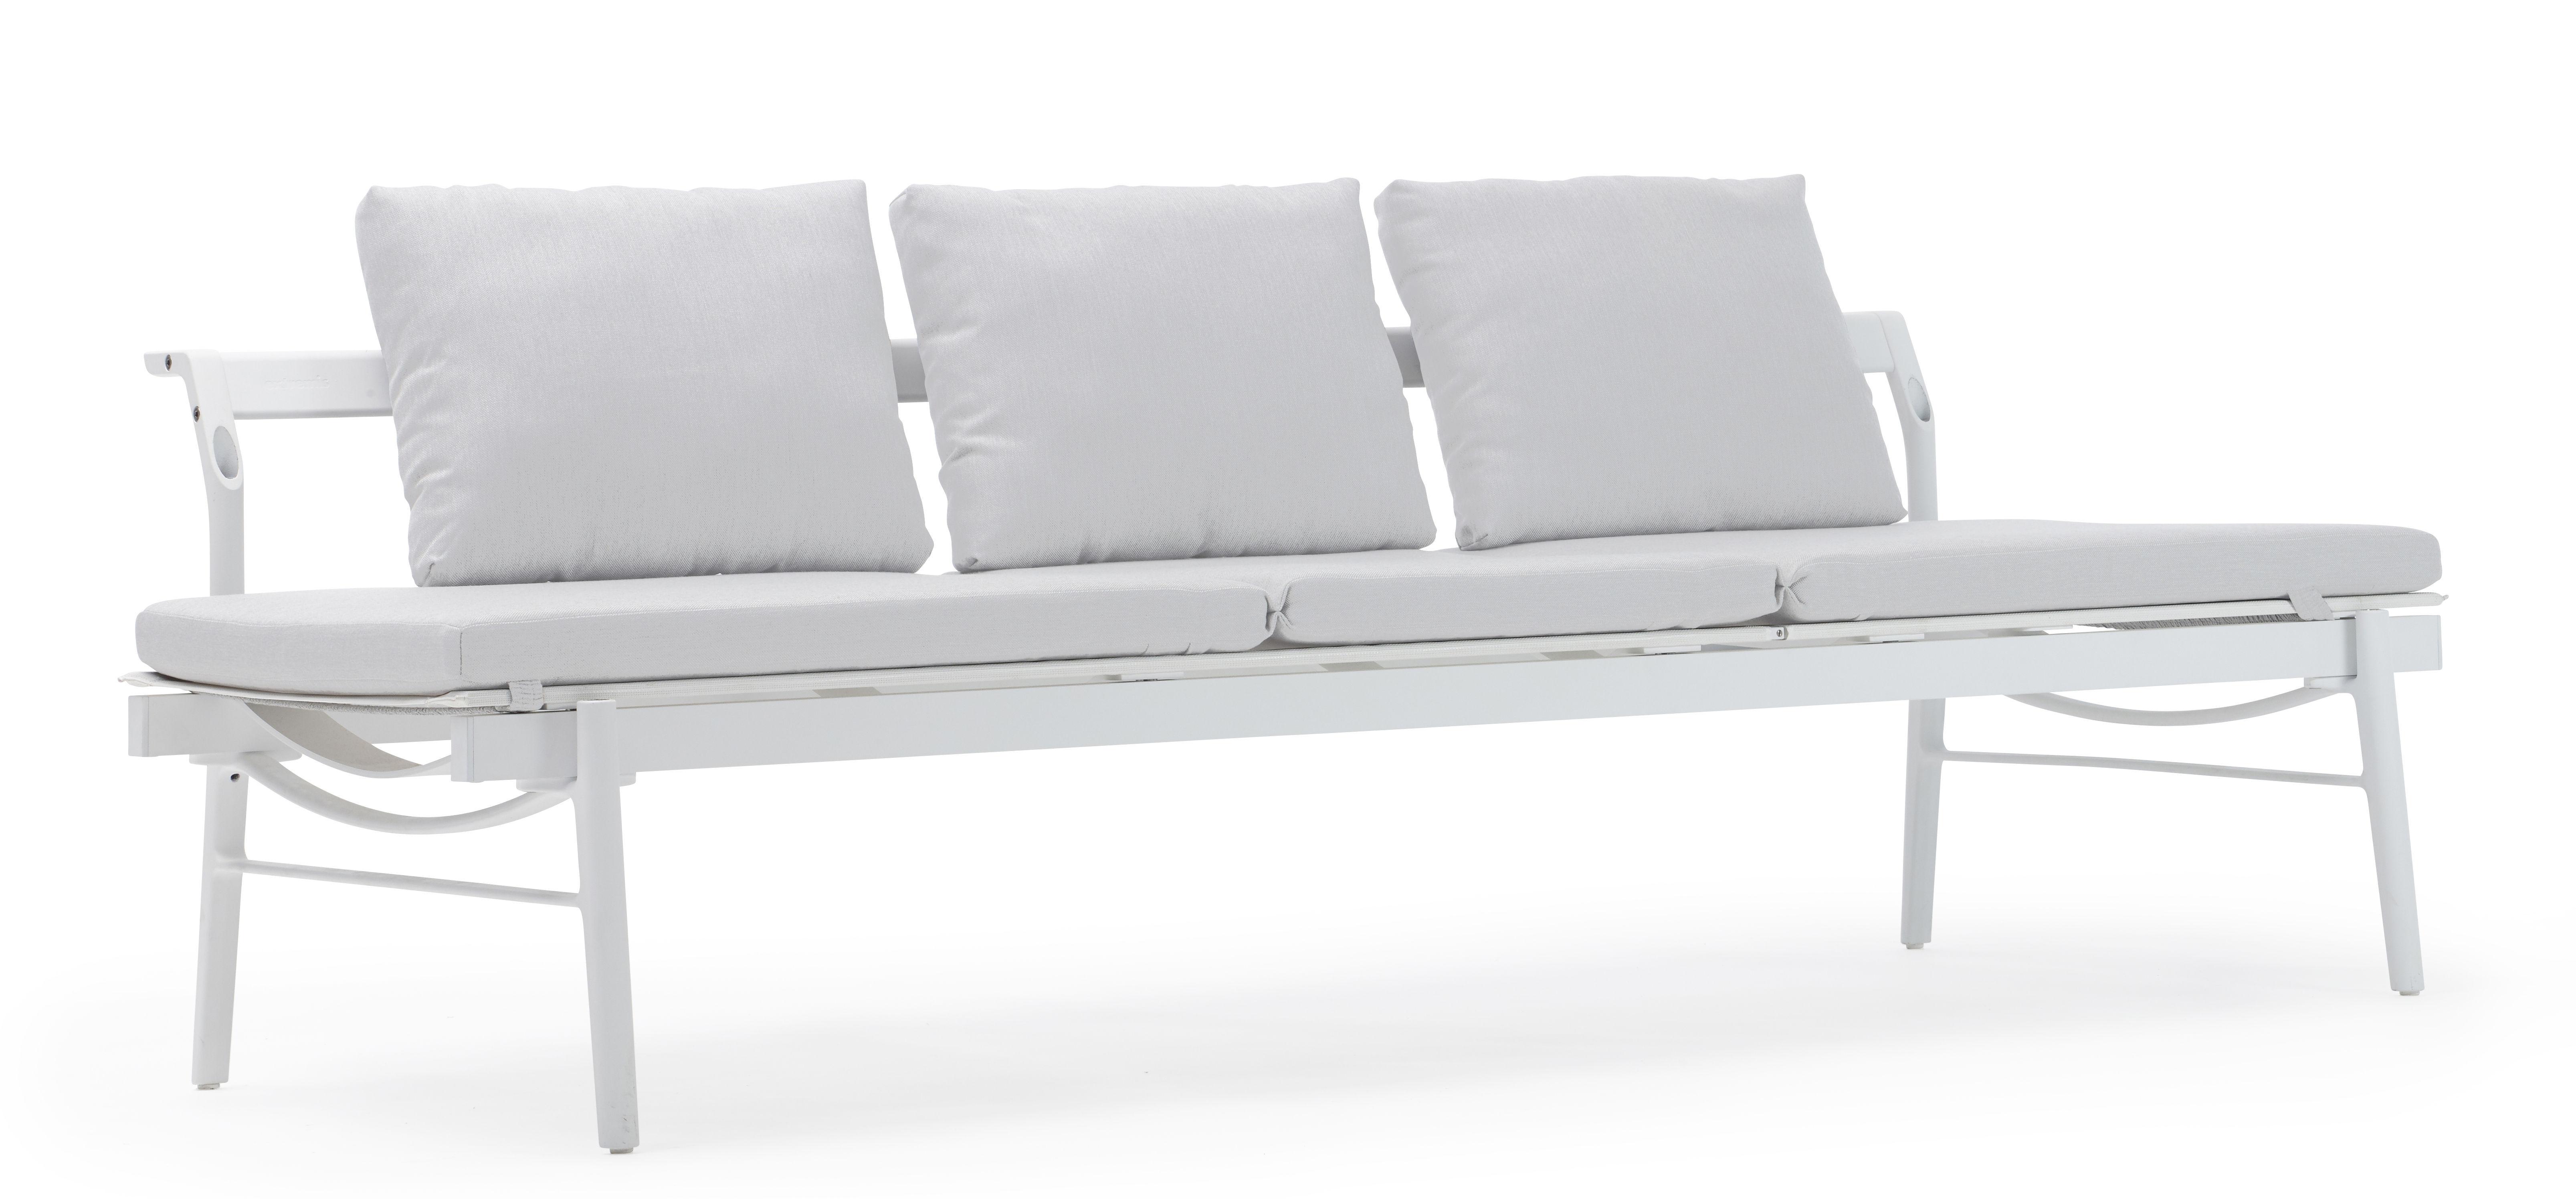 f r sonnenliege australis 200 x 63 cm extremis matratzen. Black Bedroom Furniture Sets. Home Design Ideas